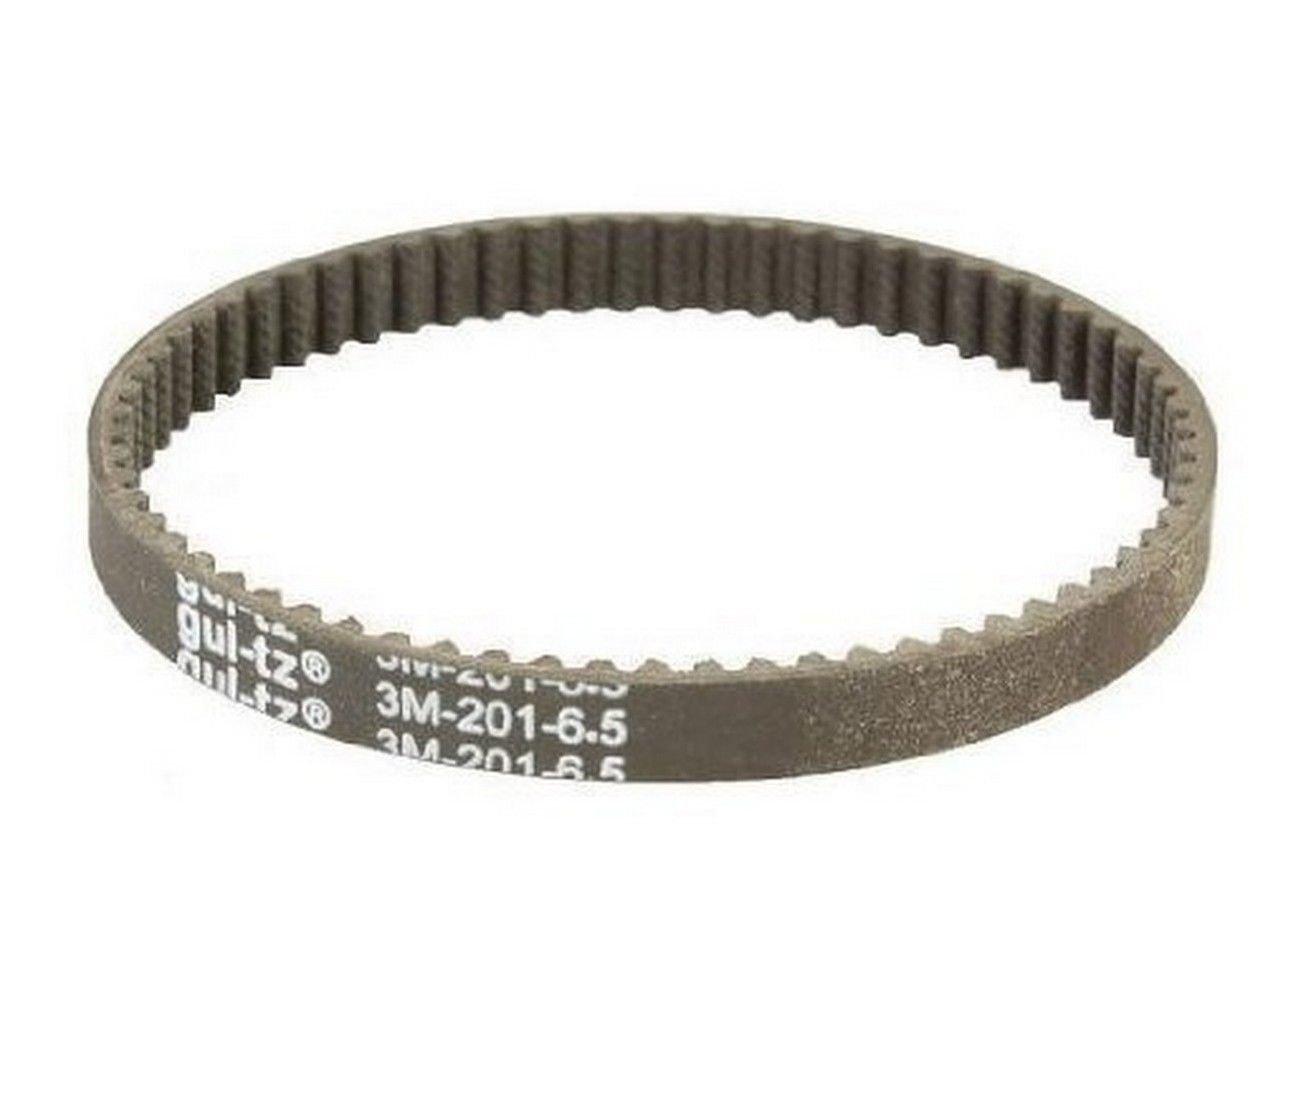 bartyspares® Vax Air 3 Agile U87-AA-Be U87AABE Vacuum Cleaner Hoover toothed Belt 3M-201-6.5